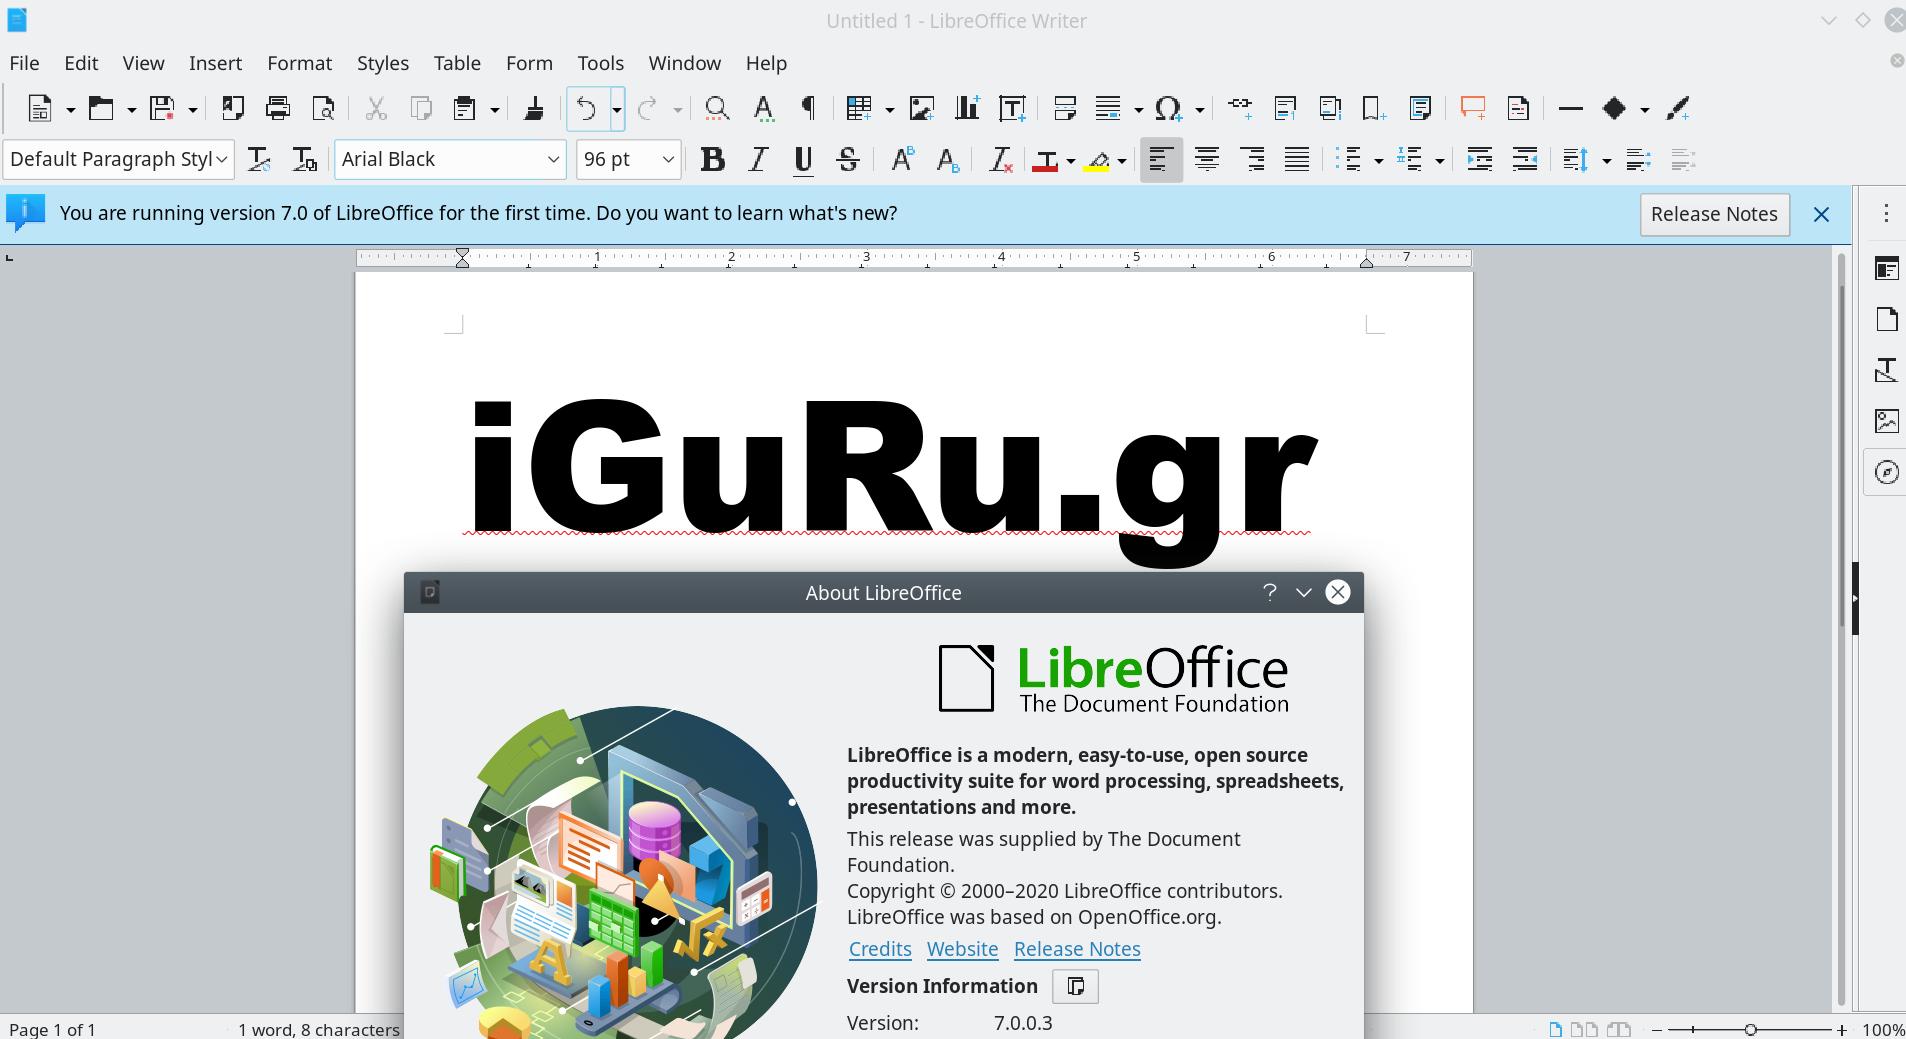 libreoffice 7 - LibreOffice 7.1.0 prerelease just released